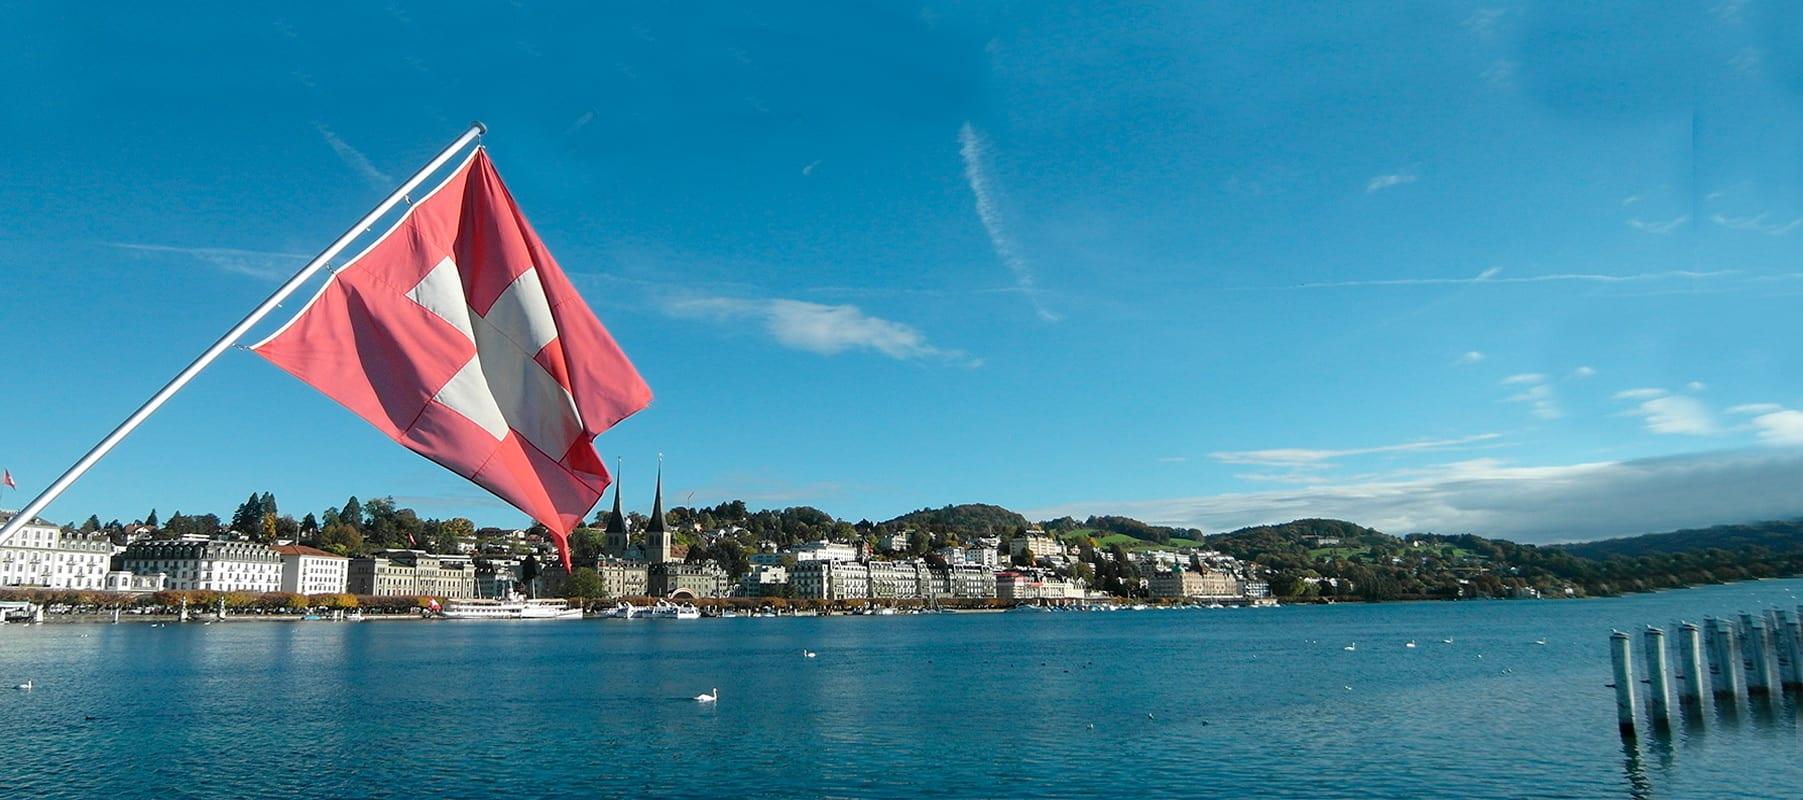 Apaixonante Suiça